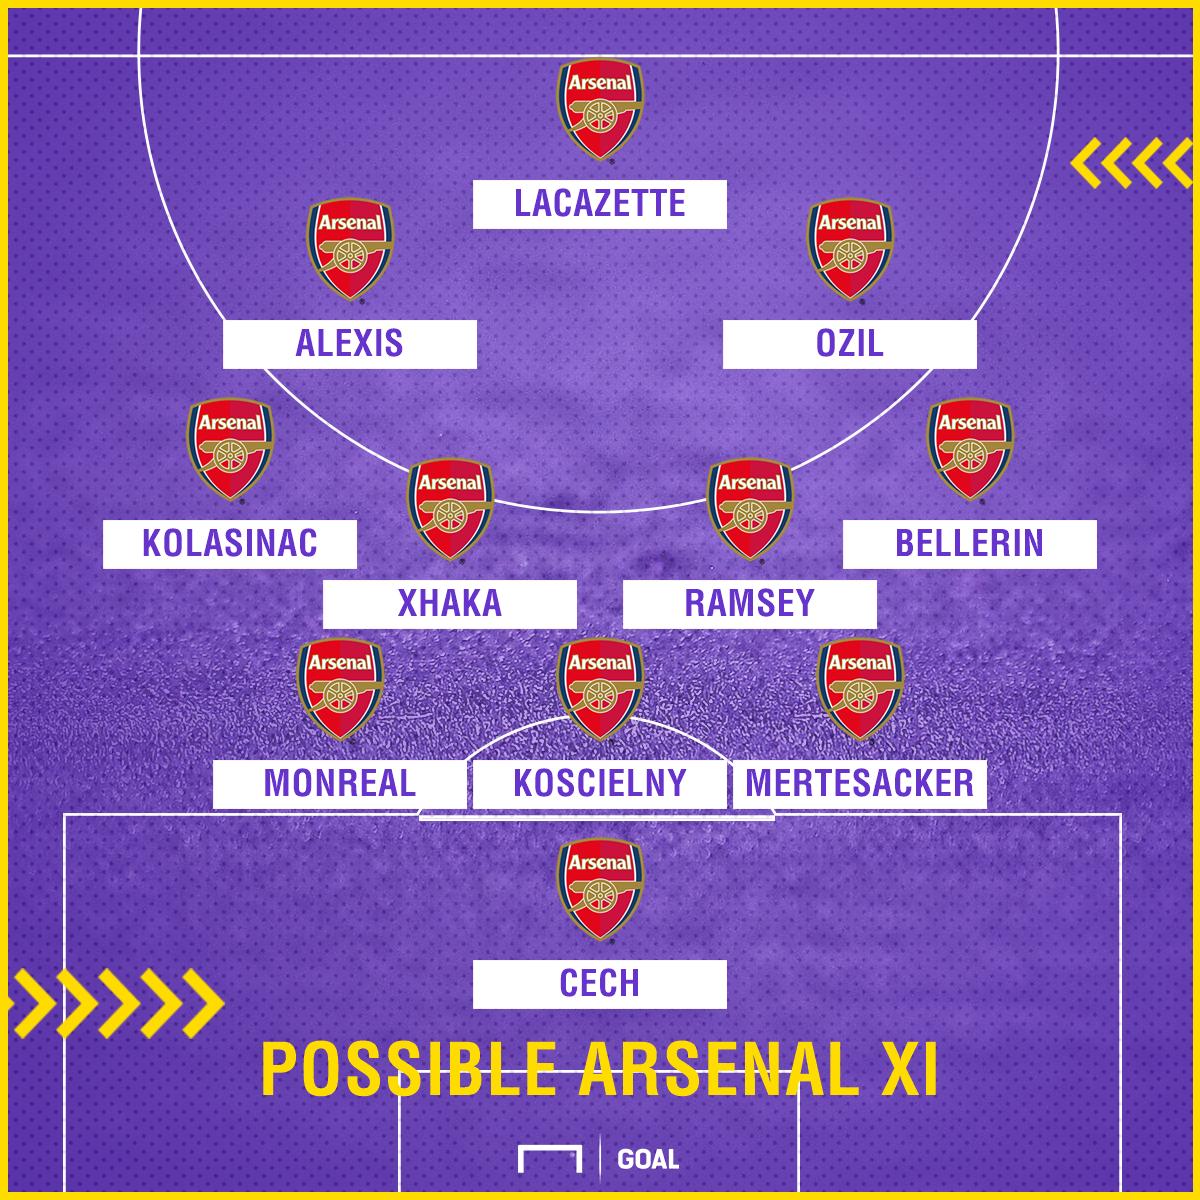 ArsenalXI